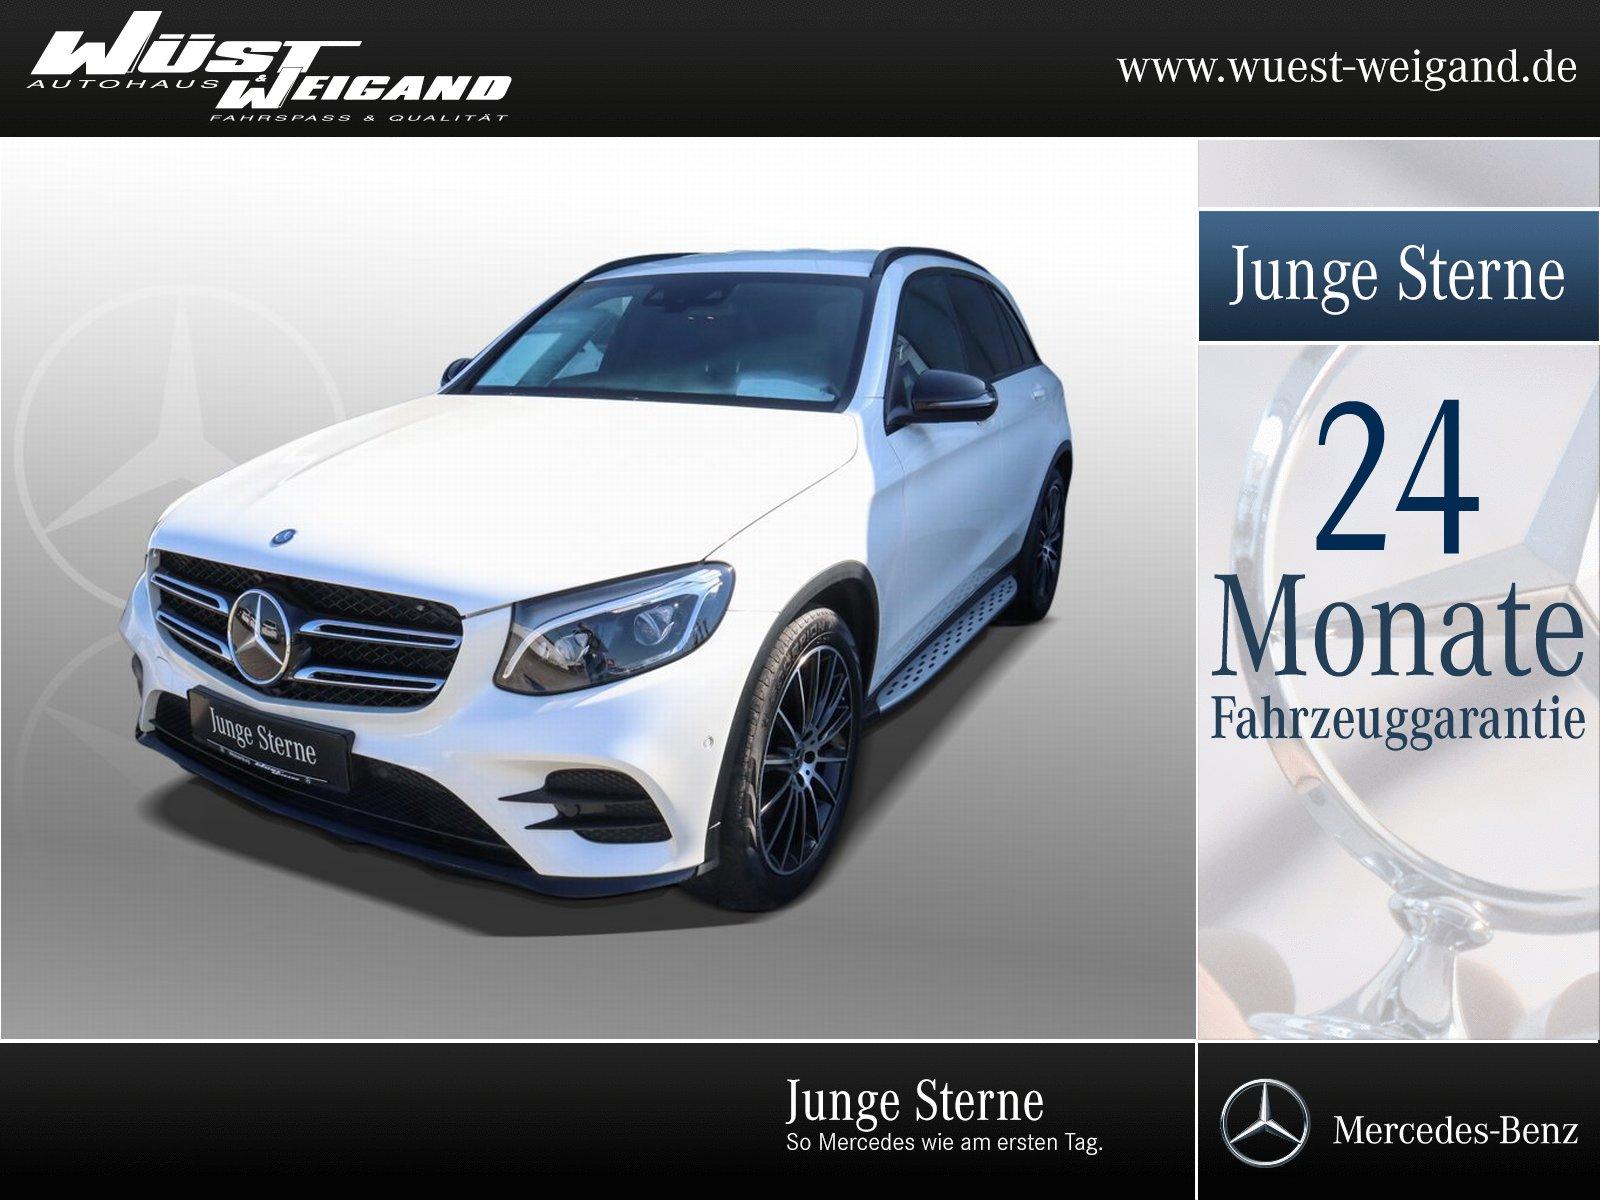 Mercedes-Benz GLC 350 d 4MATIC AMG-Line+AHK+Distronic+Kamera, Jahr 2017, Diesel